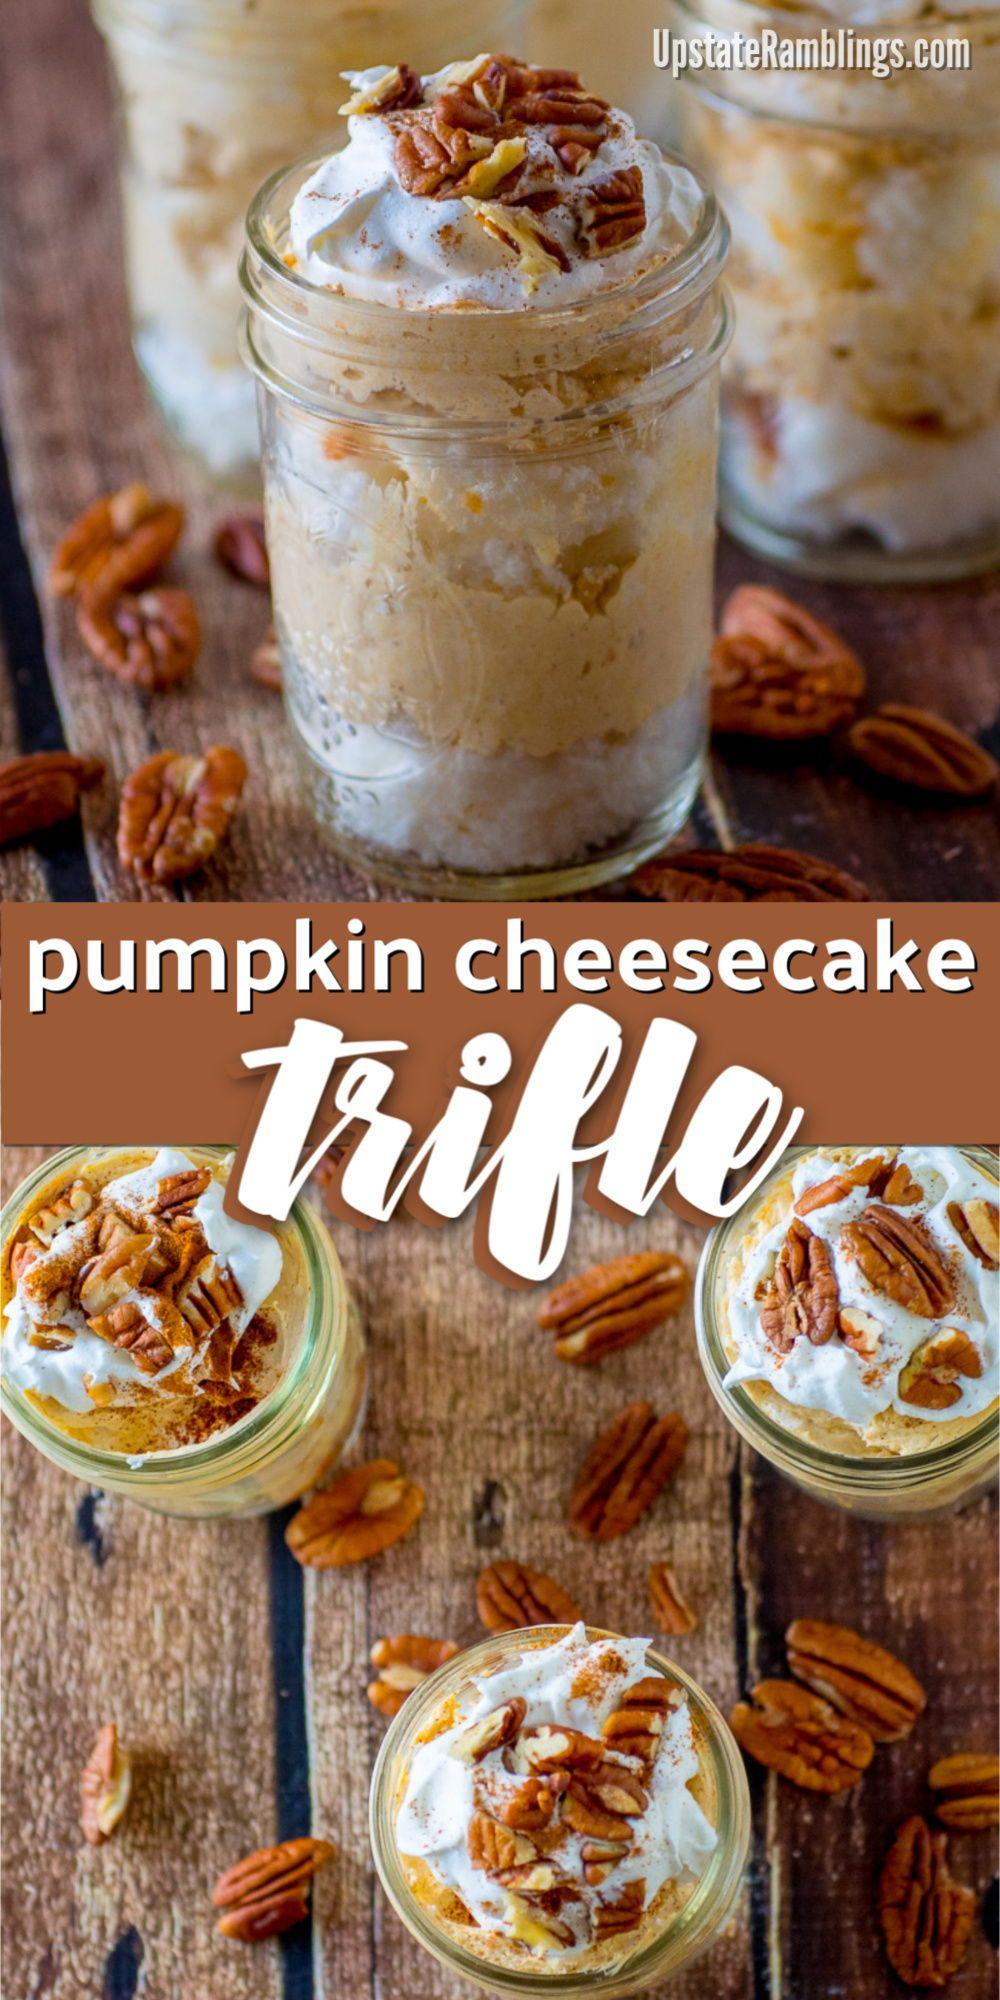 Pumpkin Cheesecake Trifle images